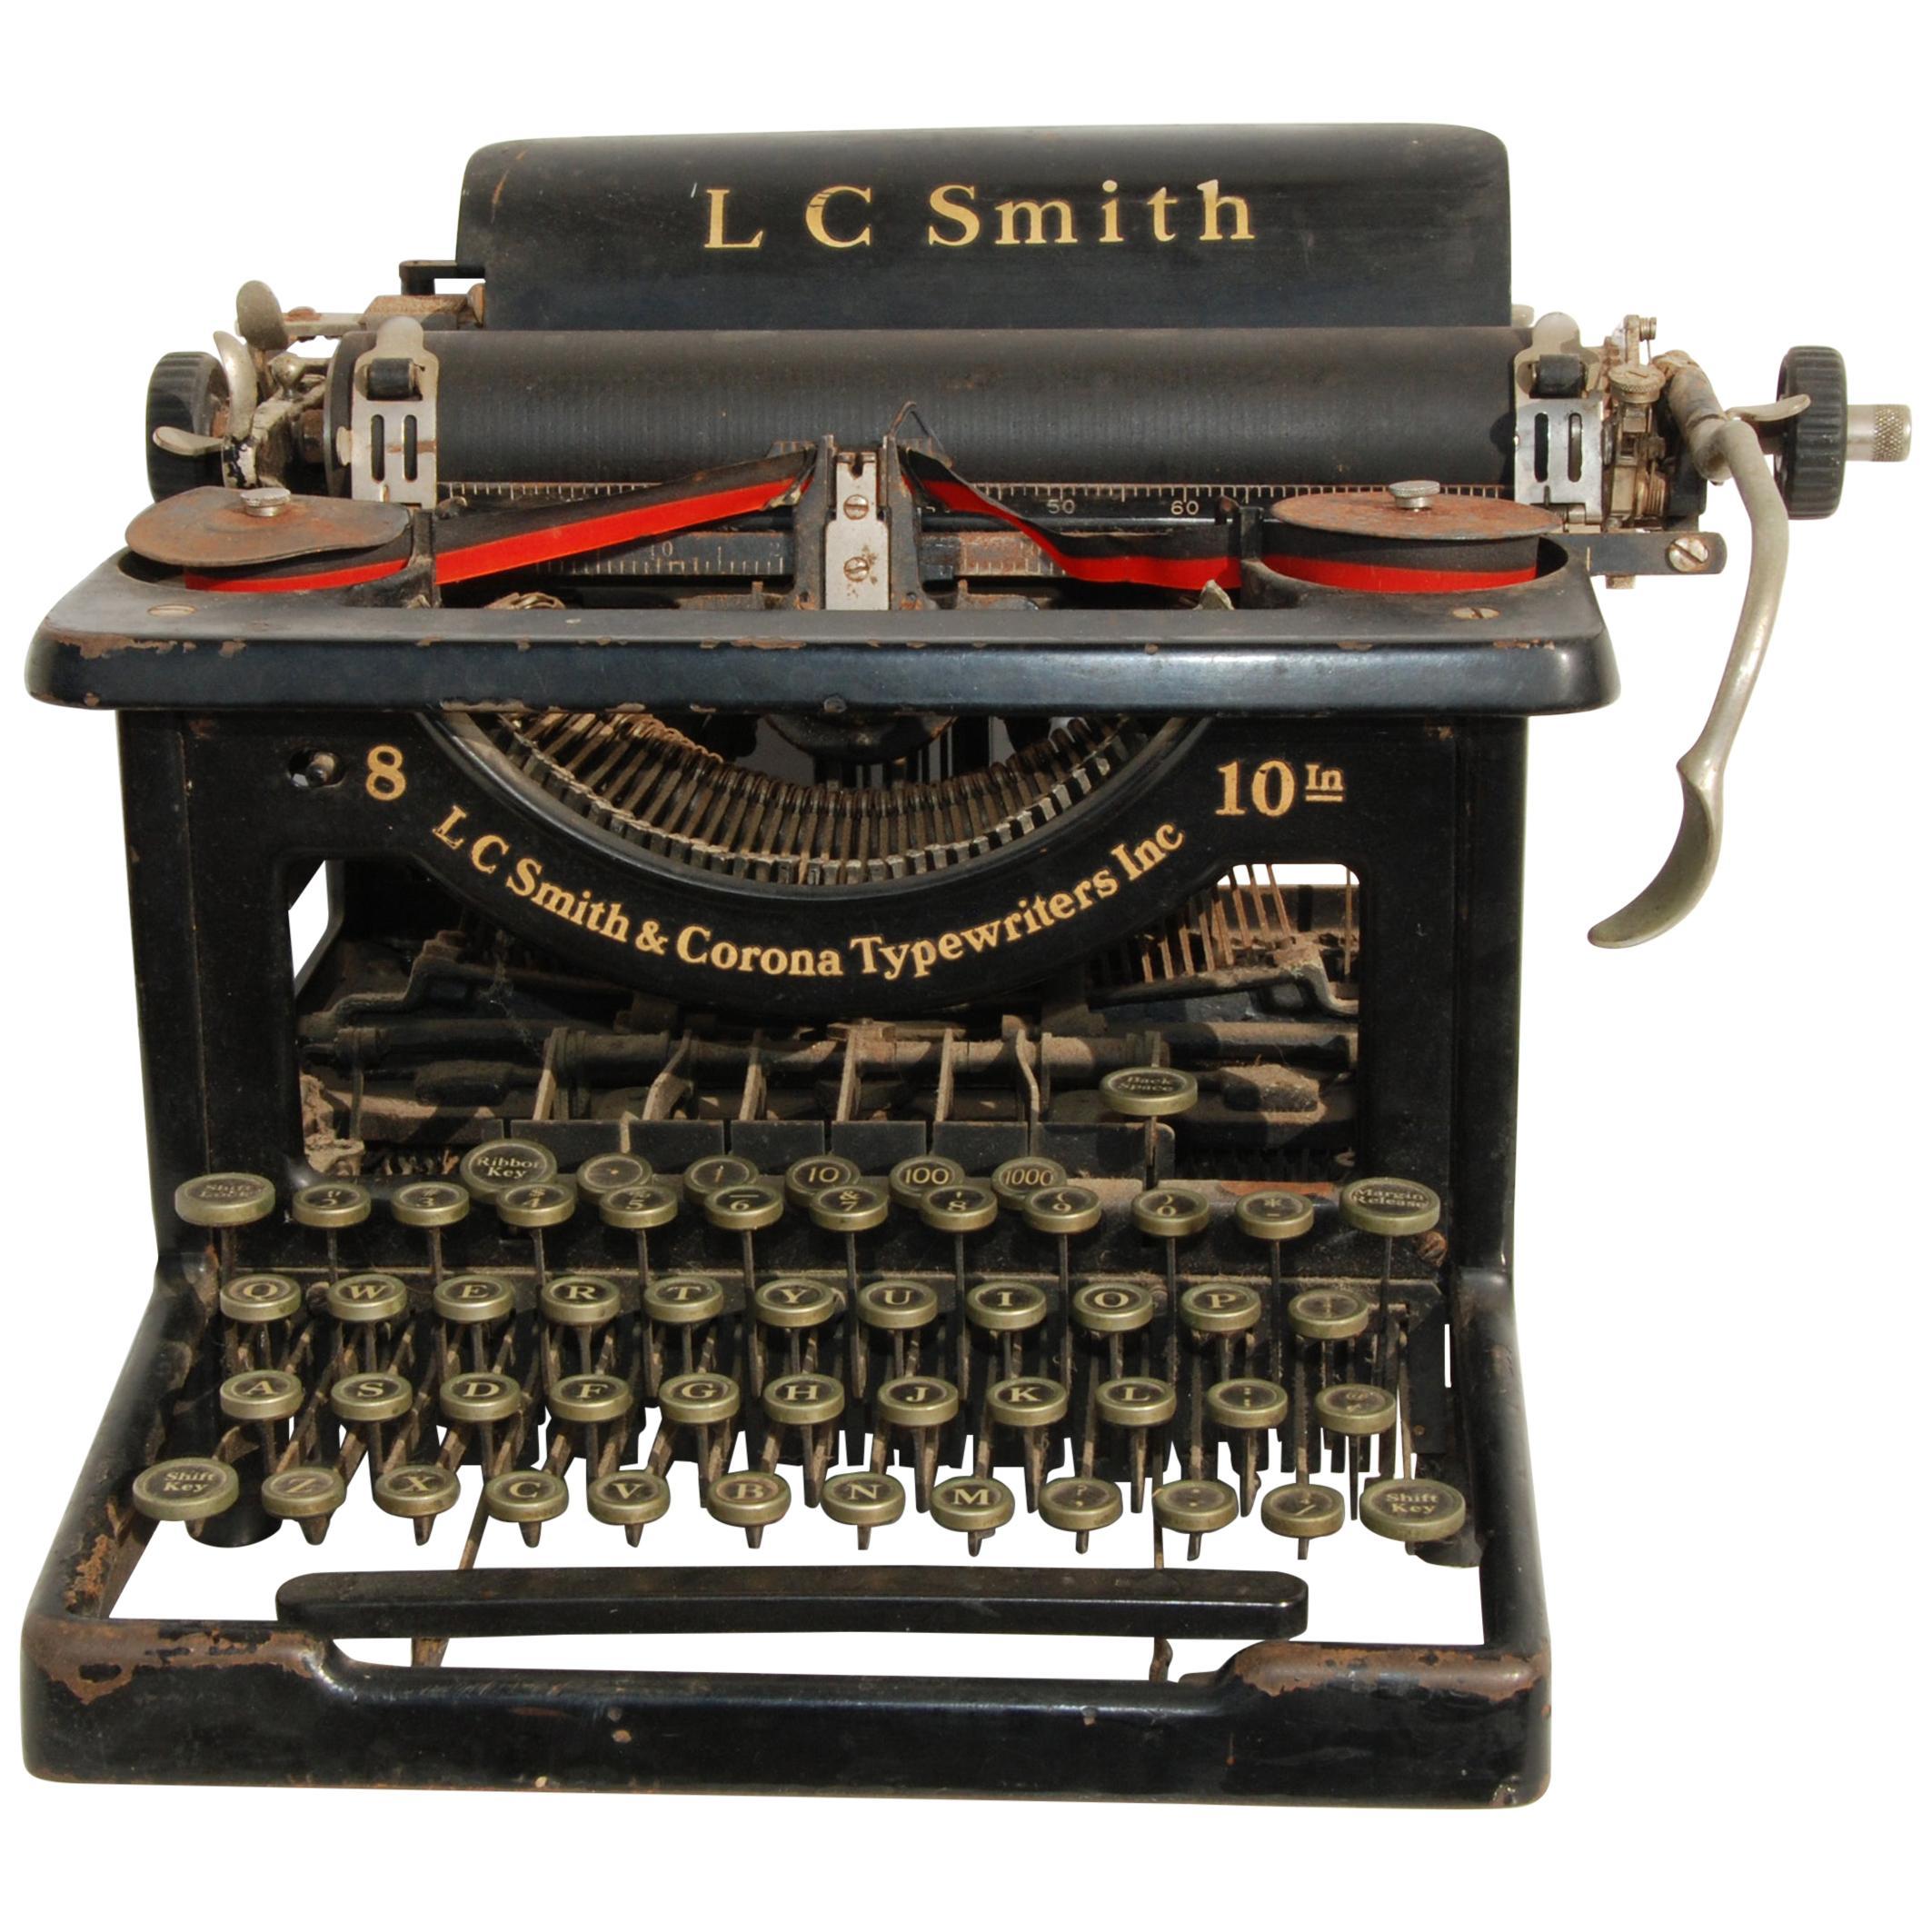 Antique LC Smith & Corona Typewriter, circa 1920s